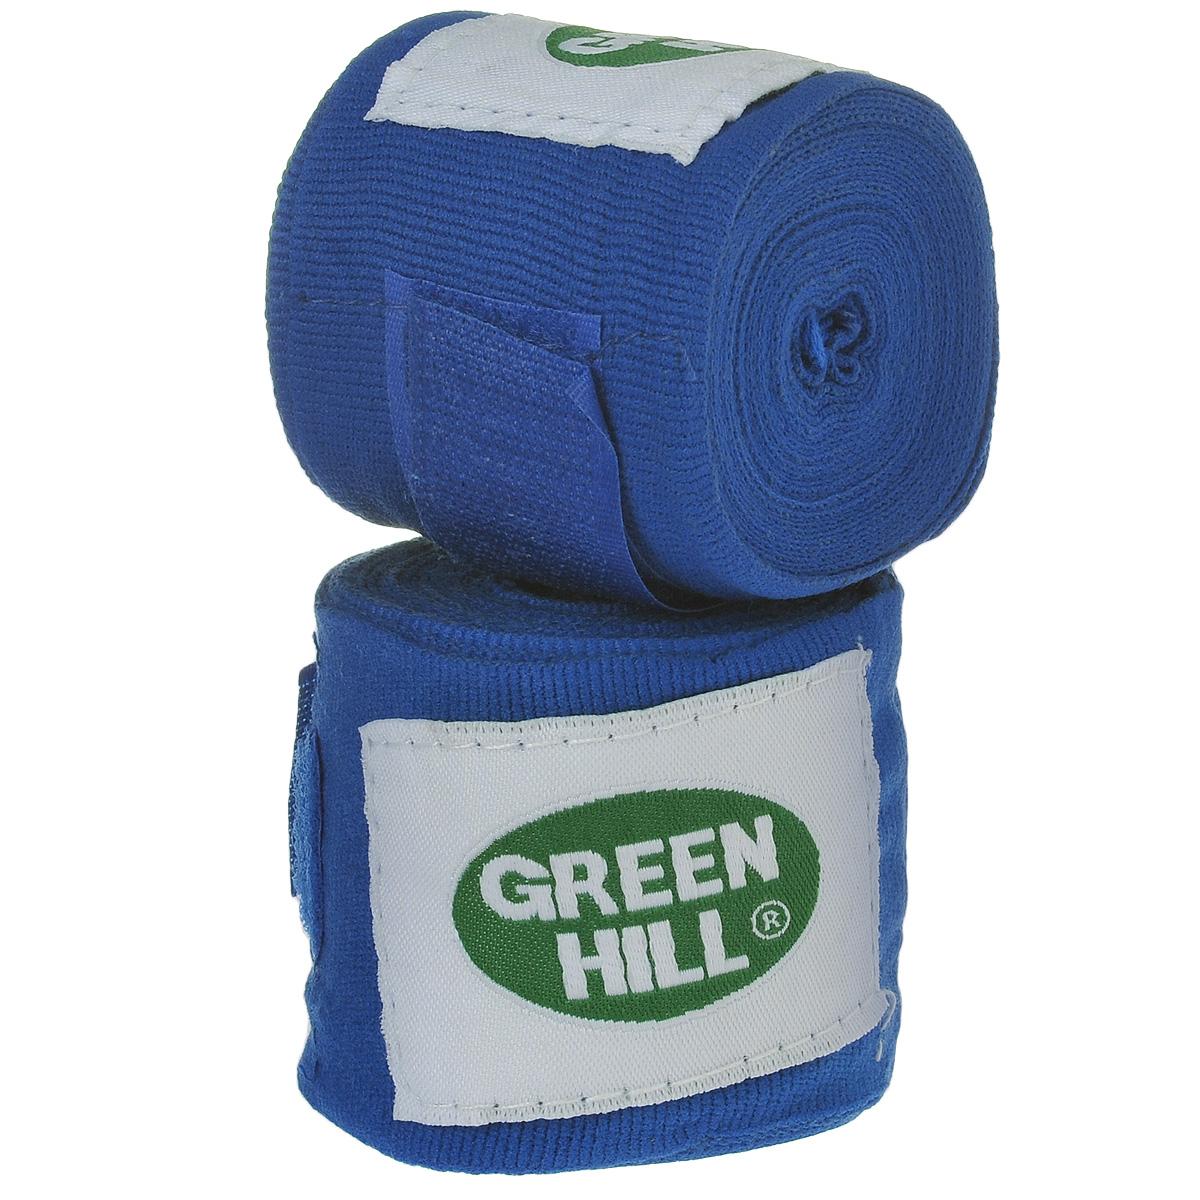 "Green Hill Бинты боксерские ""Green Hill"", эластик, цвет: синий, 2,5 м, 2 шт"